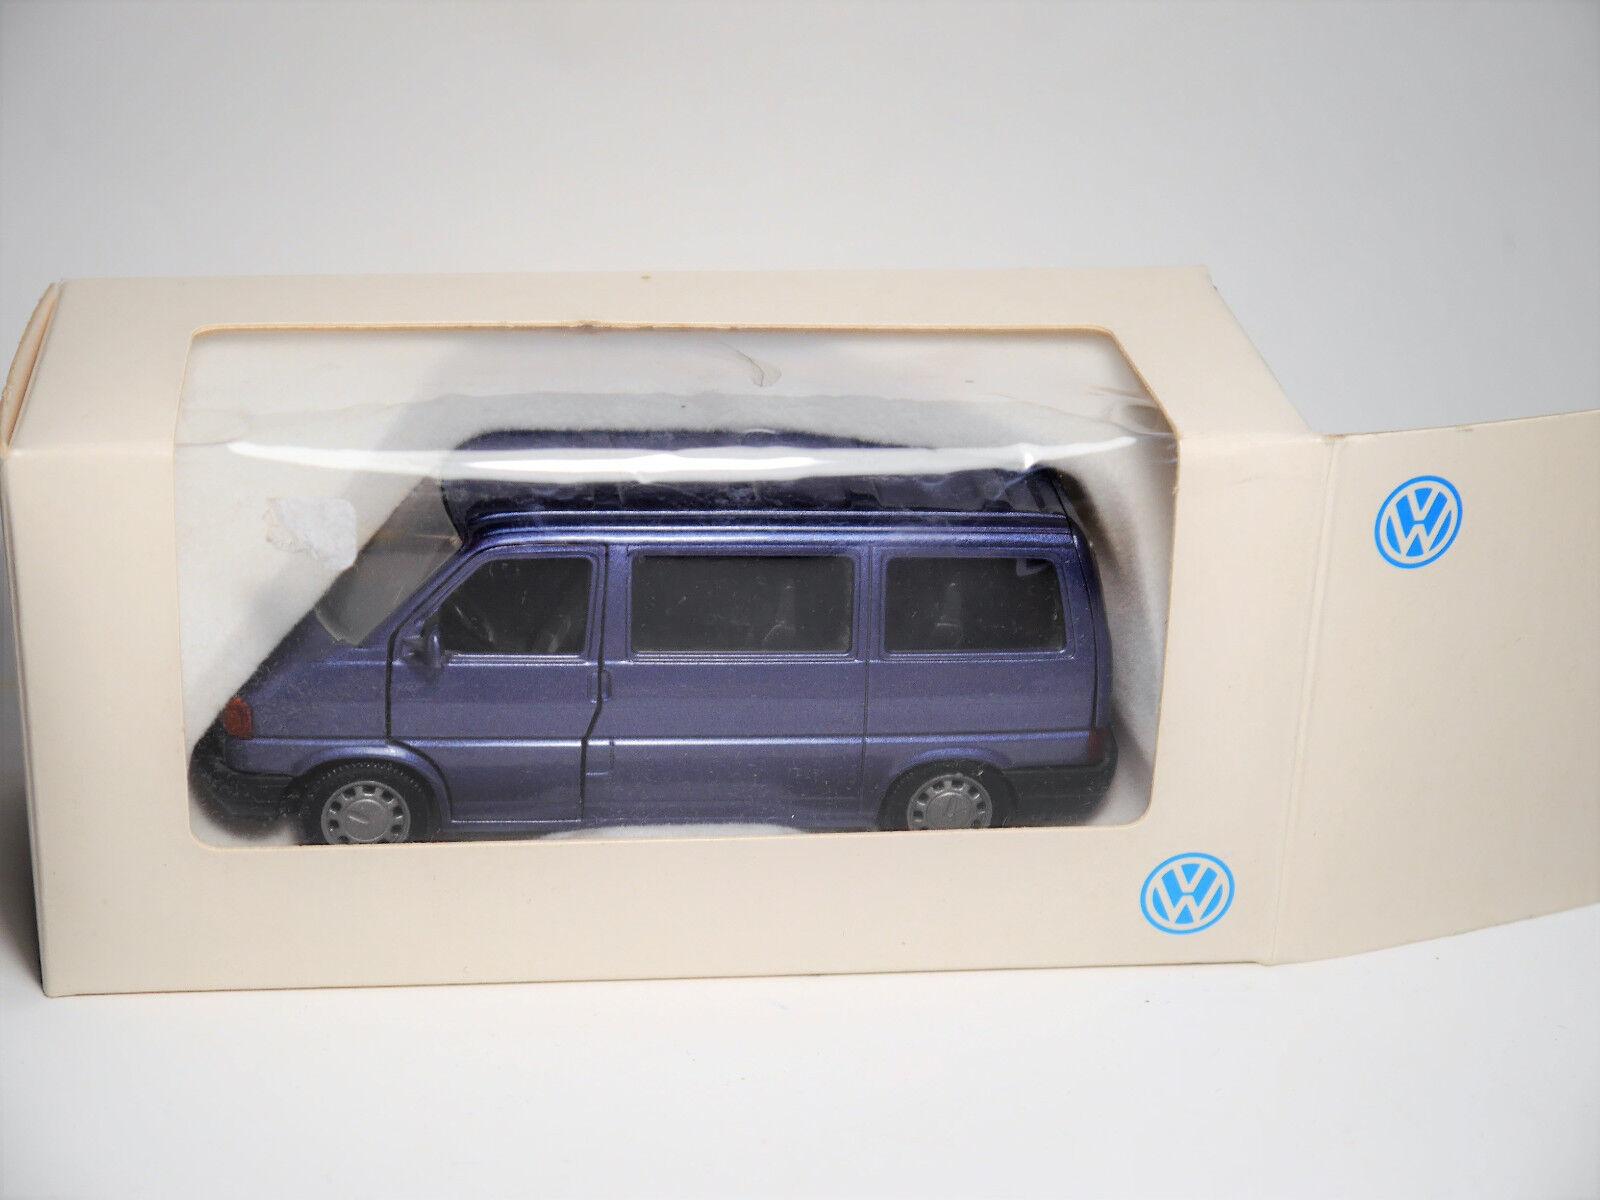 VOLKSWAGEN VW KOMBI t4 bus t4 KOMBI T 4 CARAVELLE Blu blu metallizzato, Schabak 1 43 spacciatori bed920